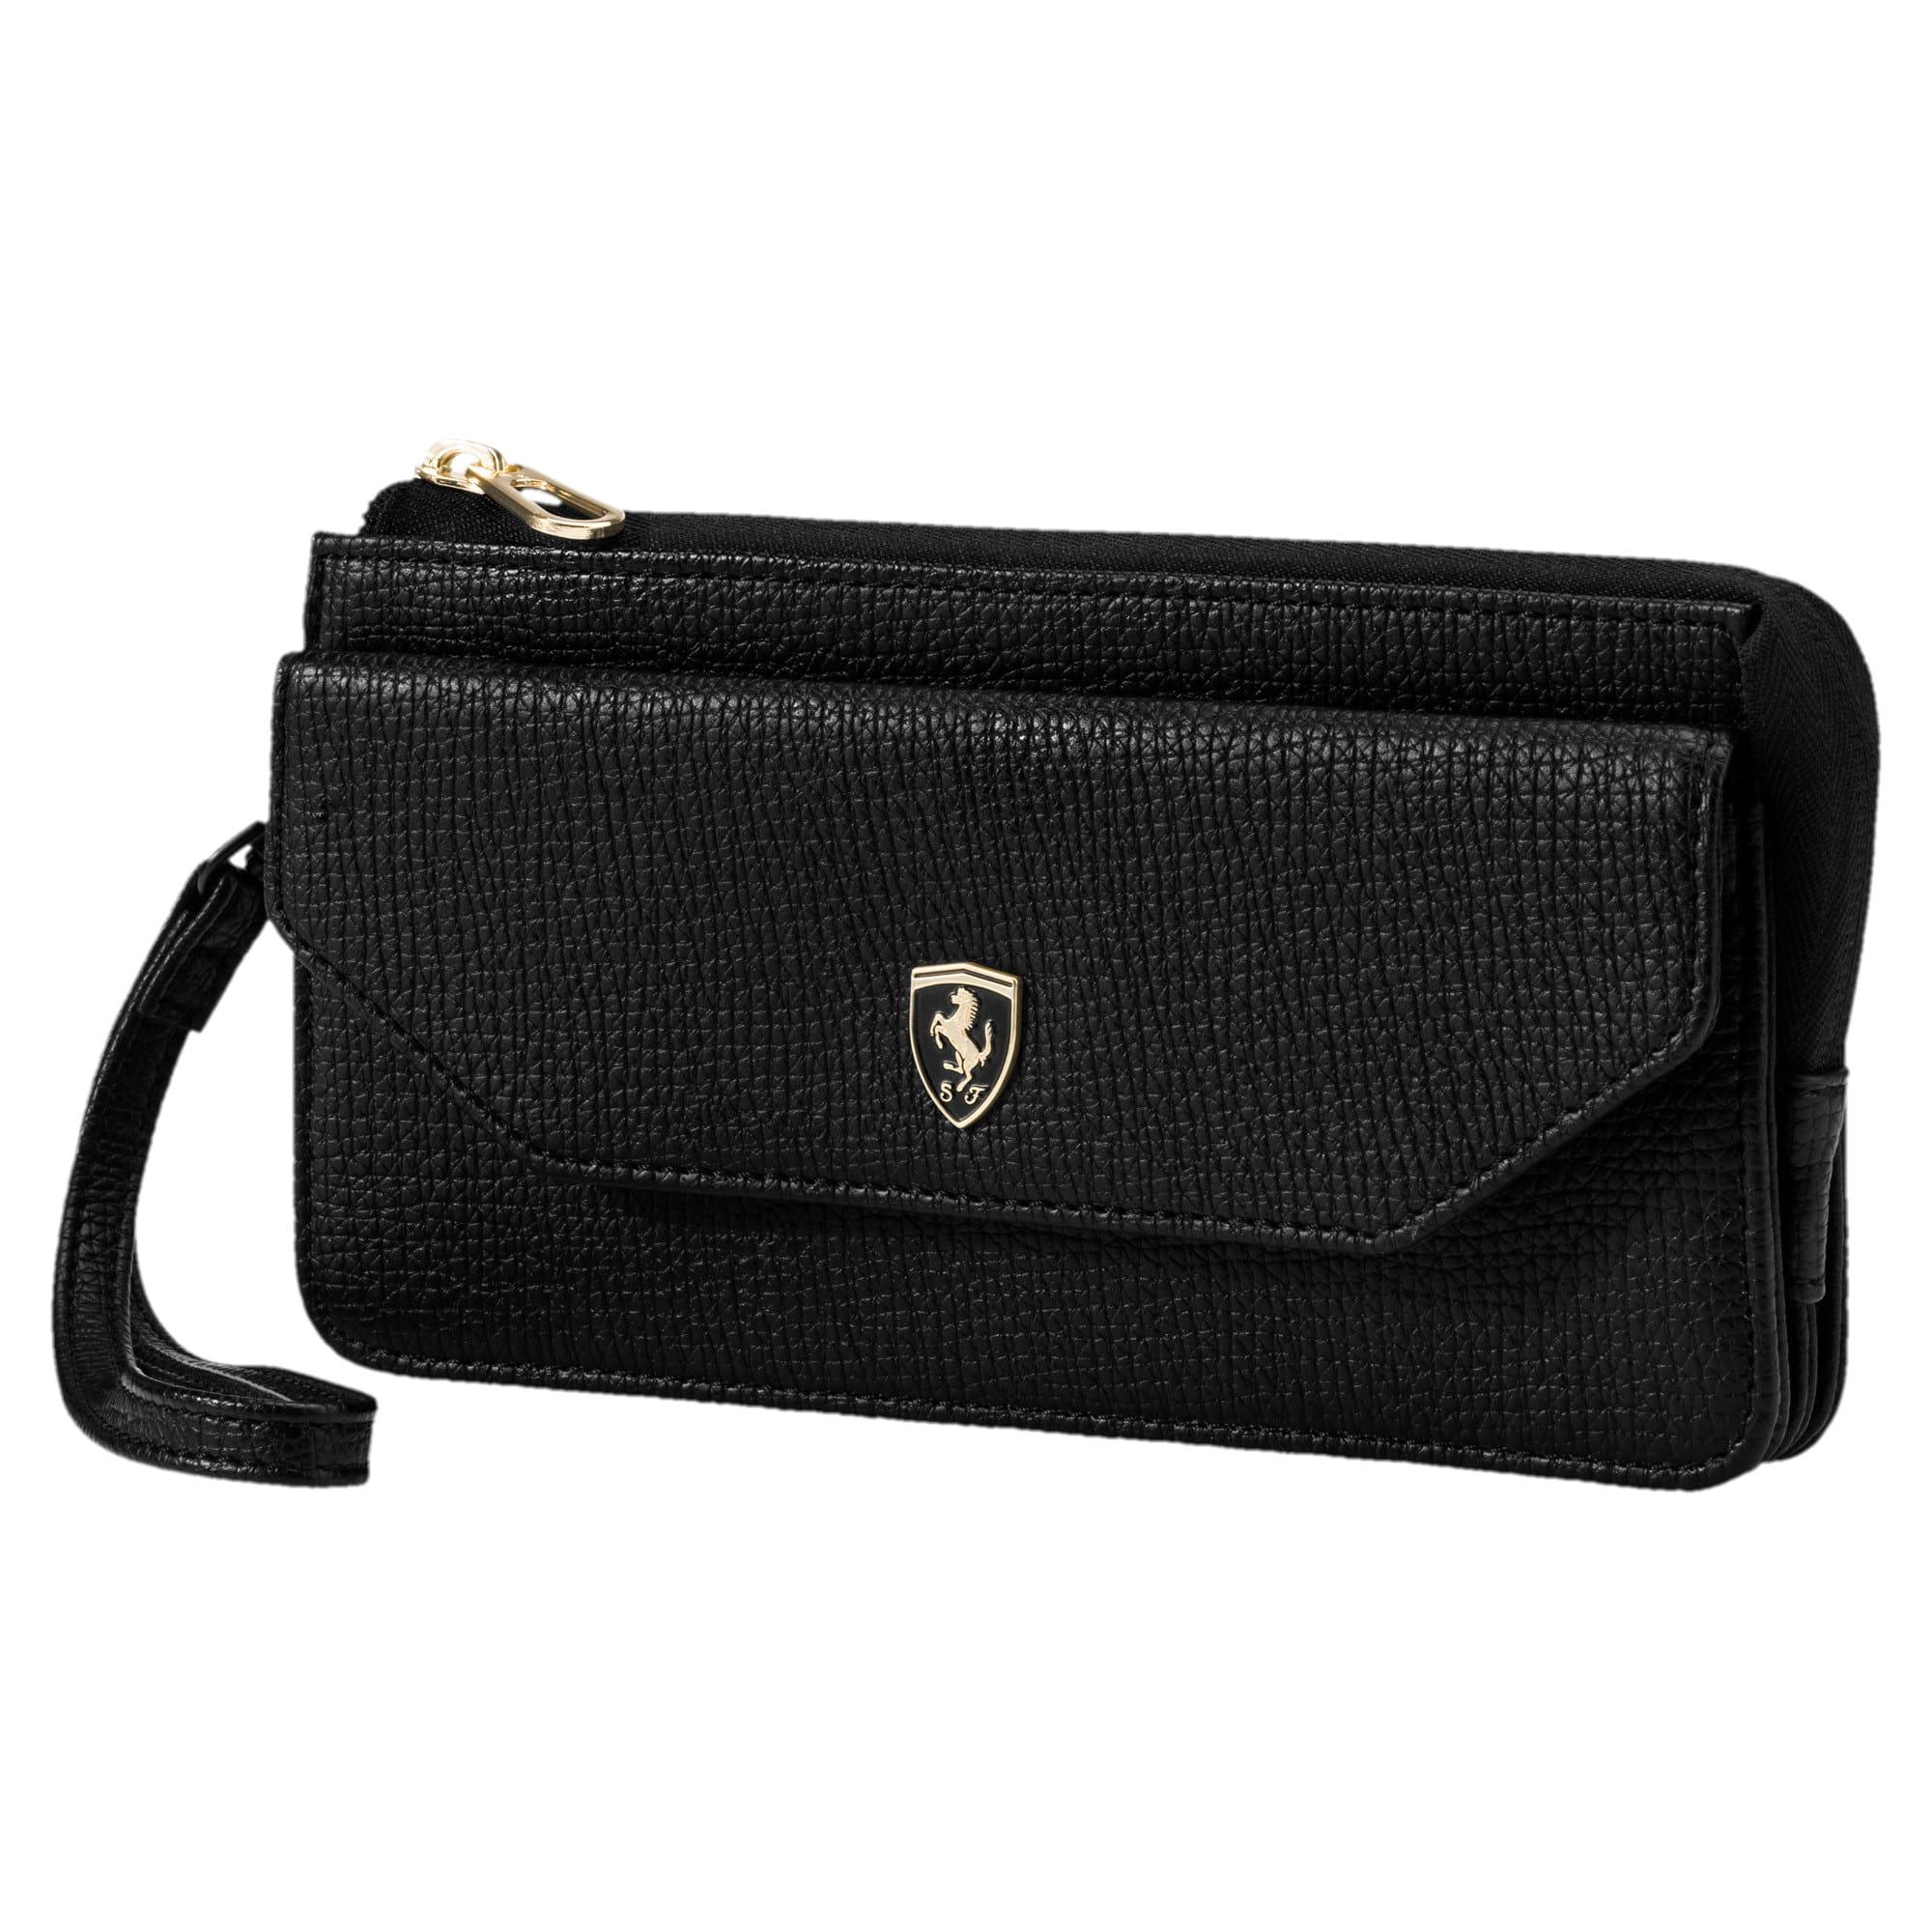 Thumbnail 1 of Ferrari Lifestyle Women's Wallet, Puma Black, medium-IND